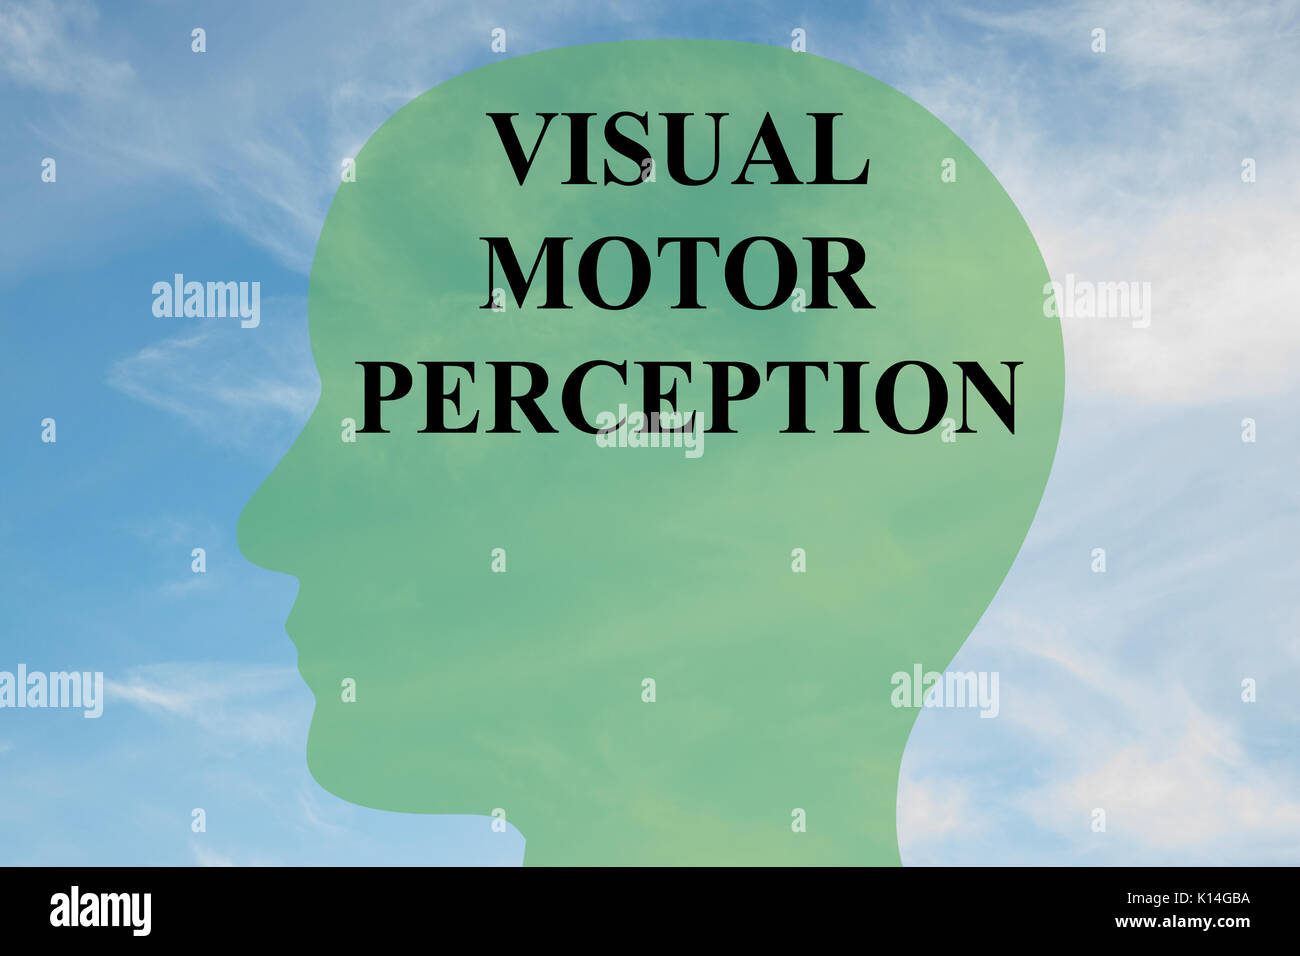 Visual Perception Stock Photos Amp Visual Perception Stock